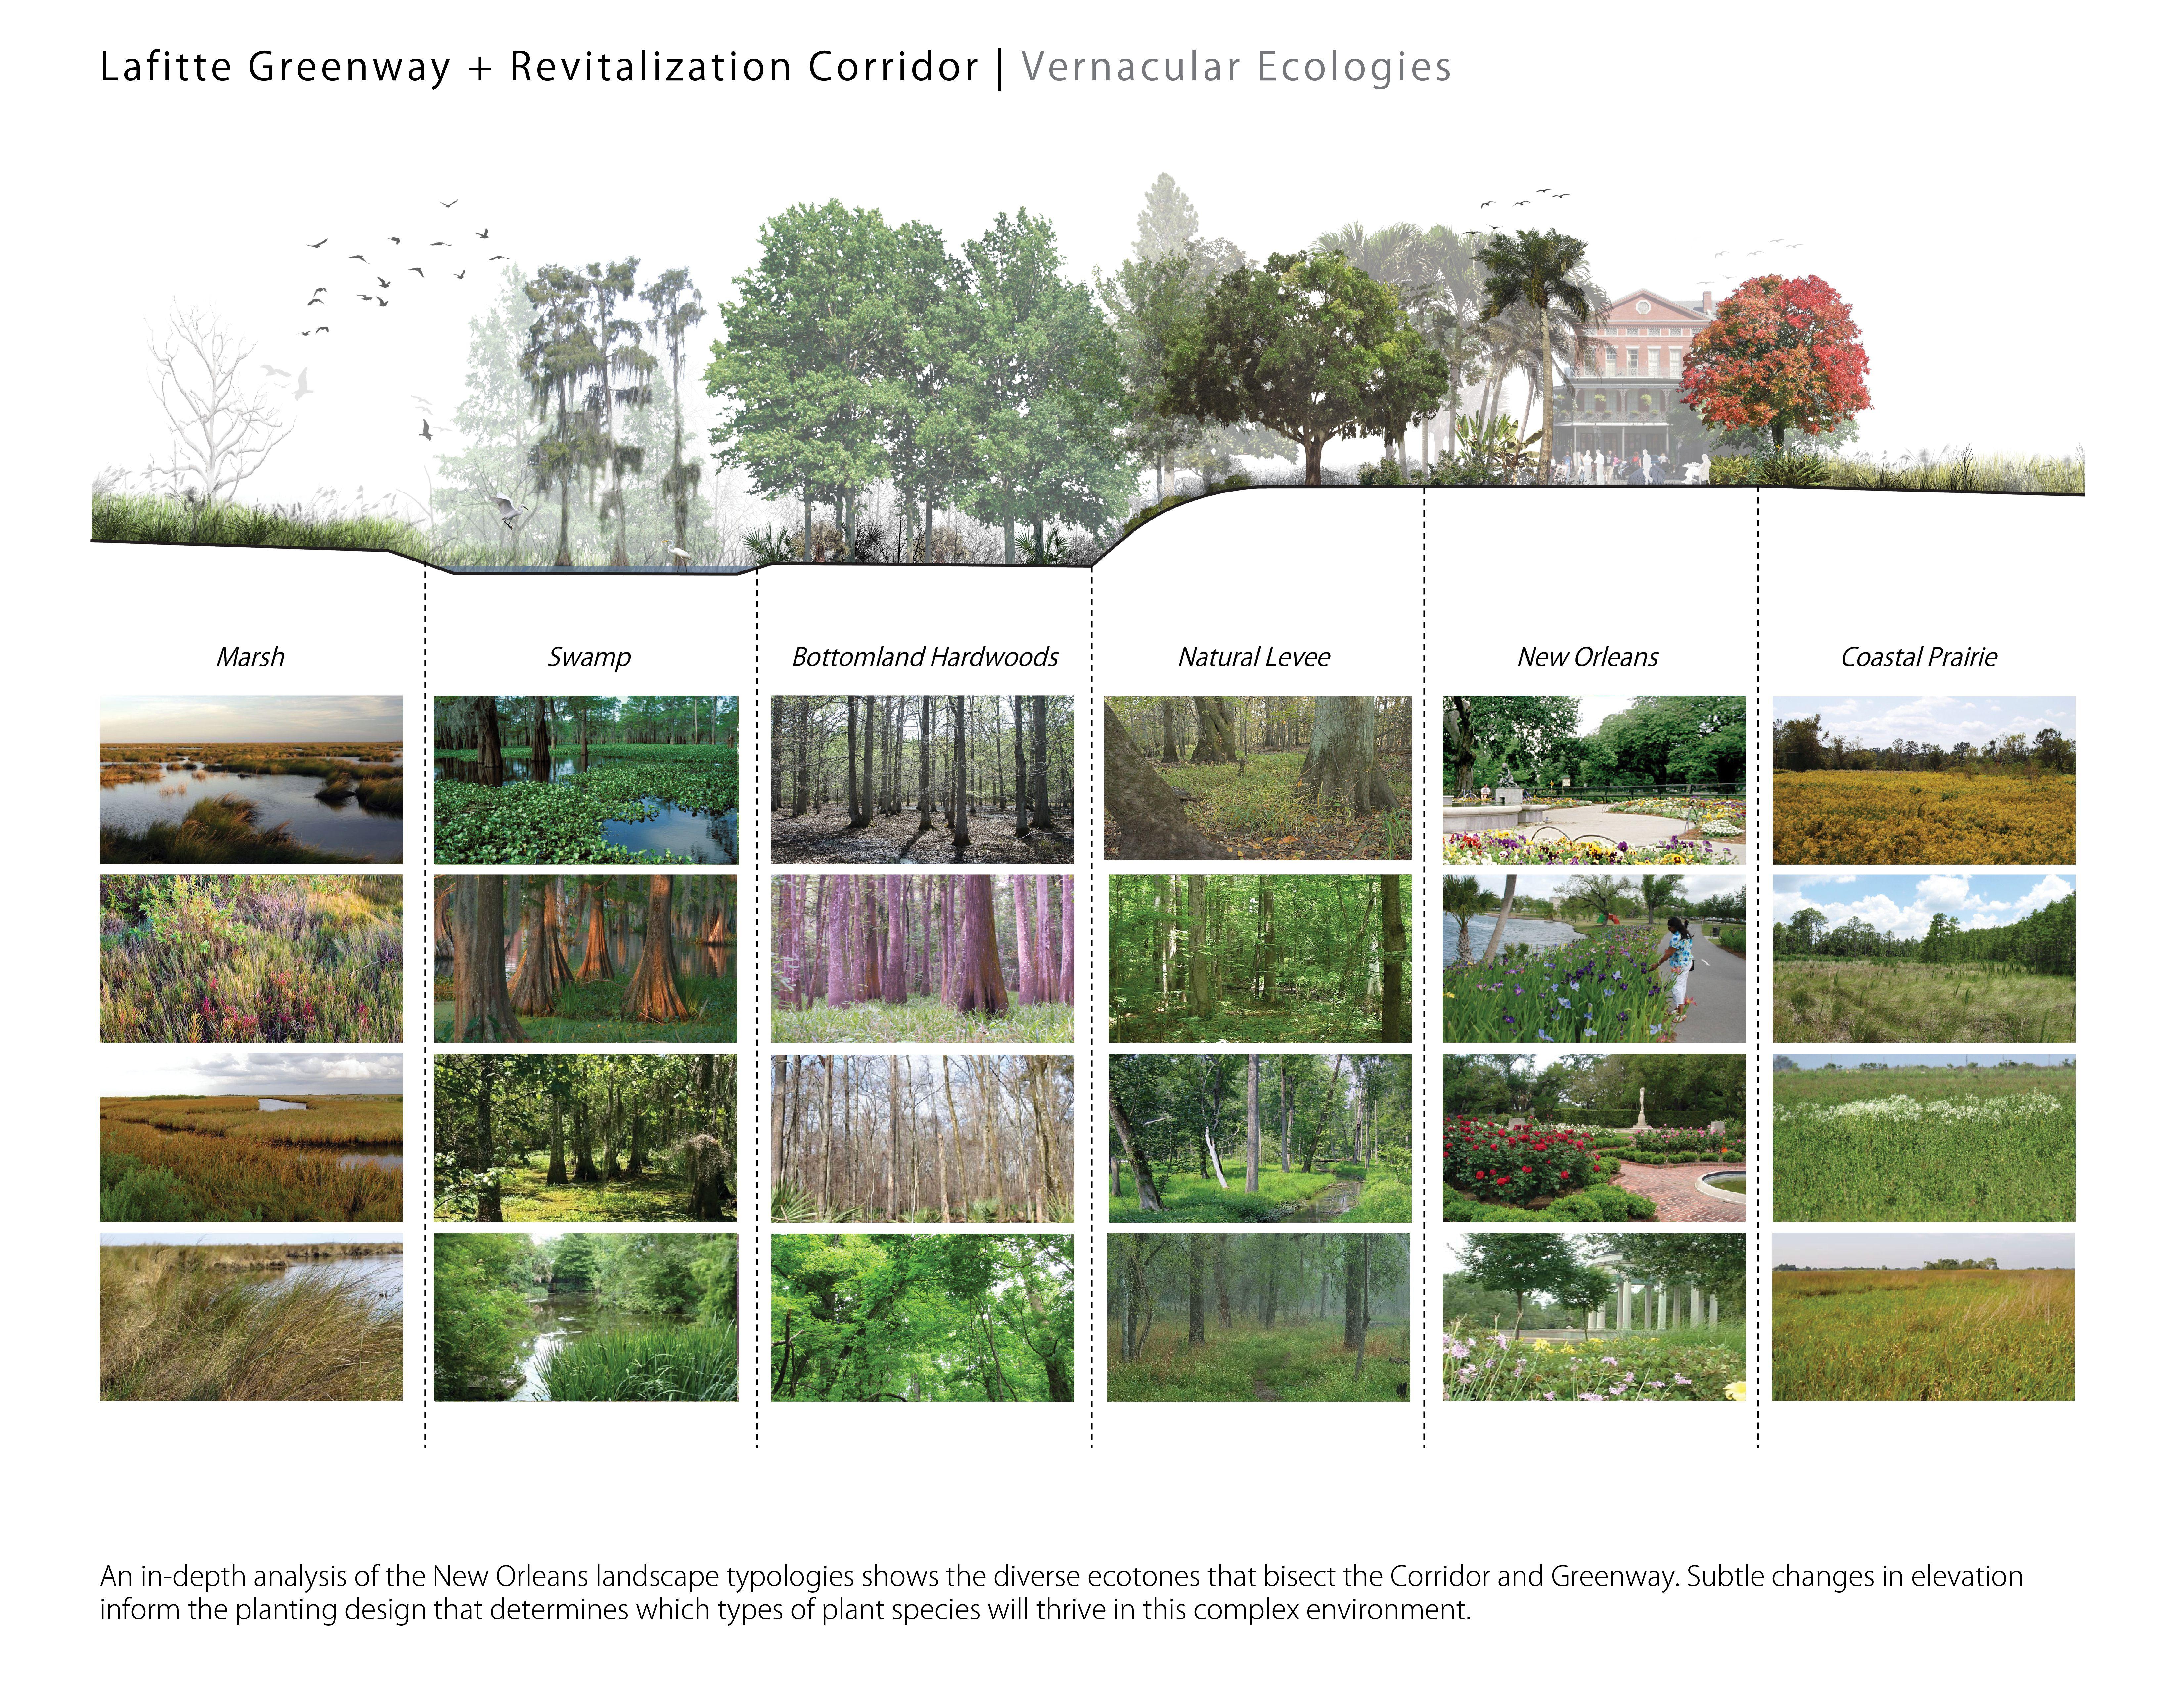 Corridor Roof Design: Lafitte Greenway + Revitalization Corridor